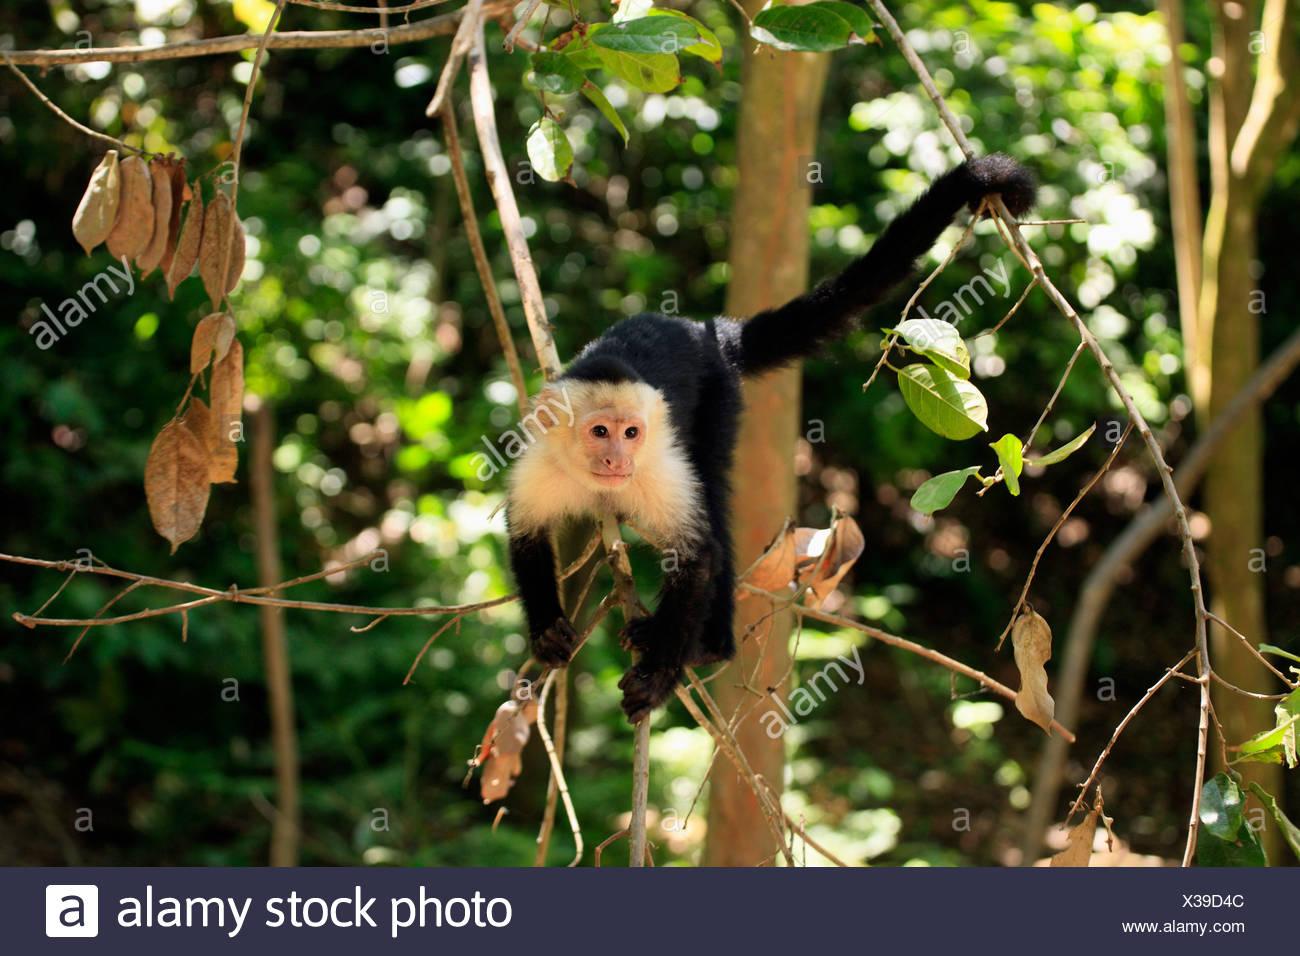 White-headed Capuchin (Cebus capucinus), male, in a tree, Roatan, Honduras, Caribbean, Central America, Latin America Stock Photo